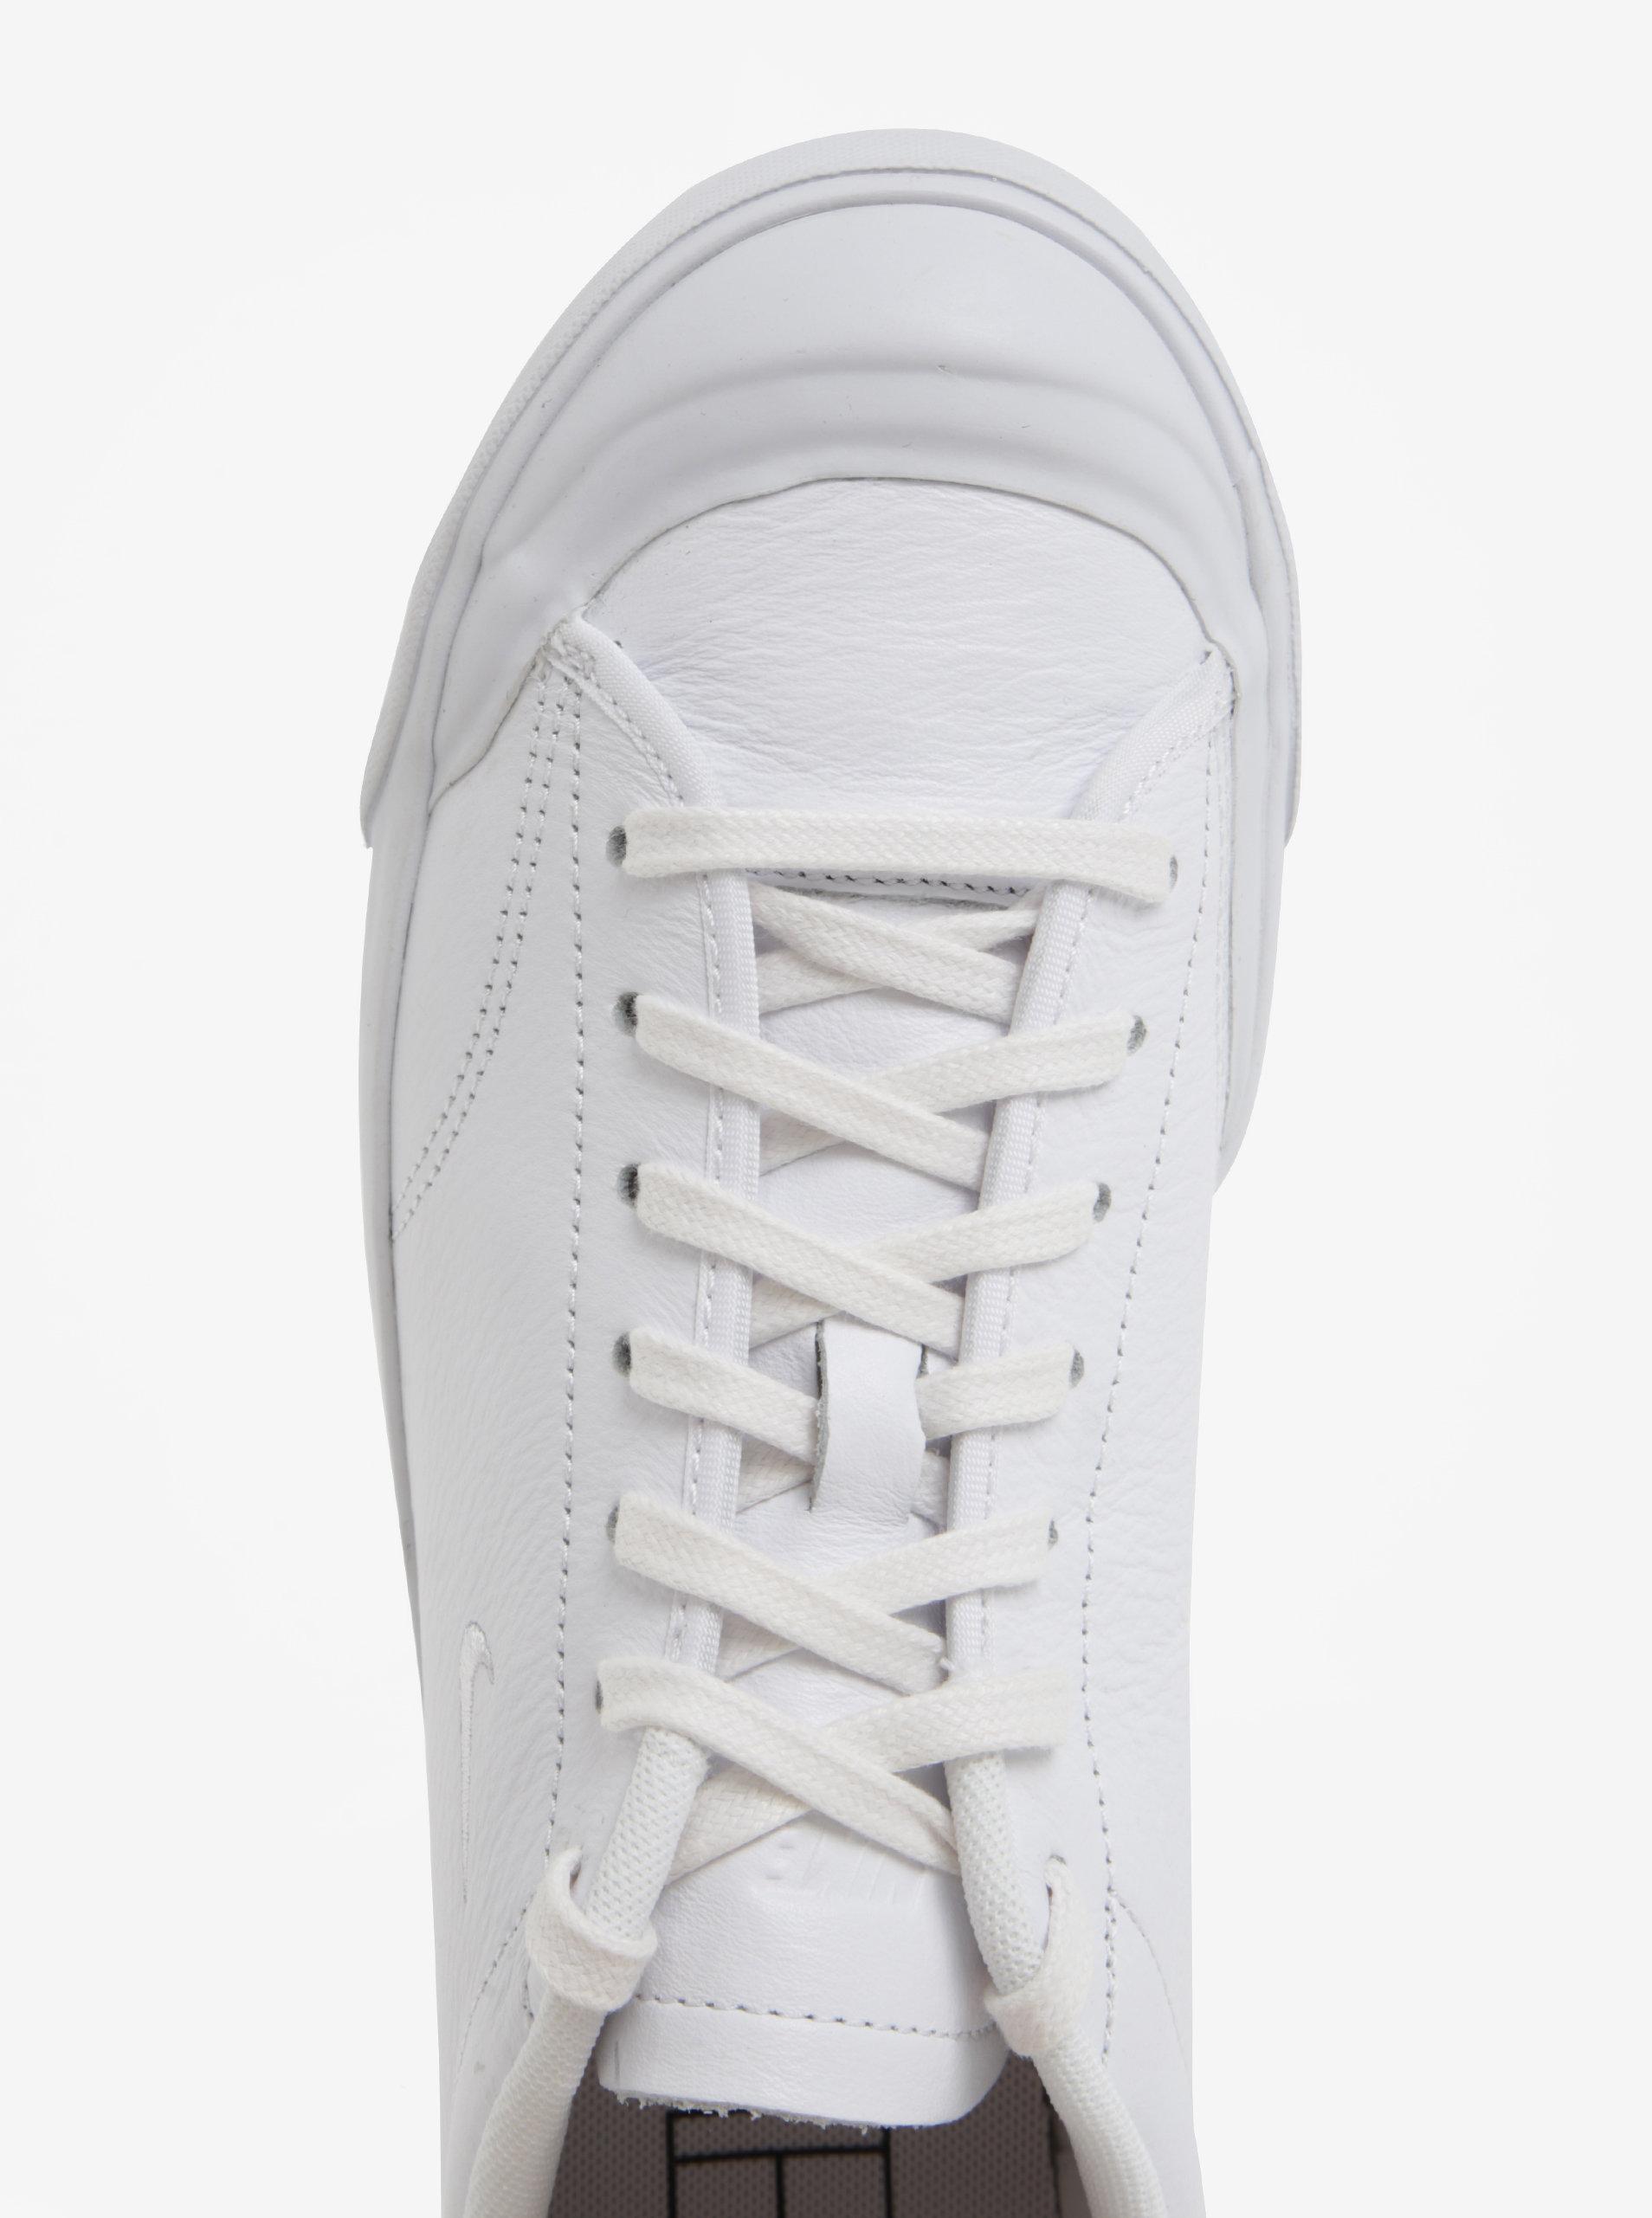 Biele pánske kožené tenisky Nike All Court 2 Low ... b6738232055